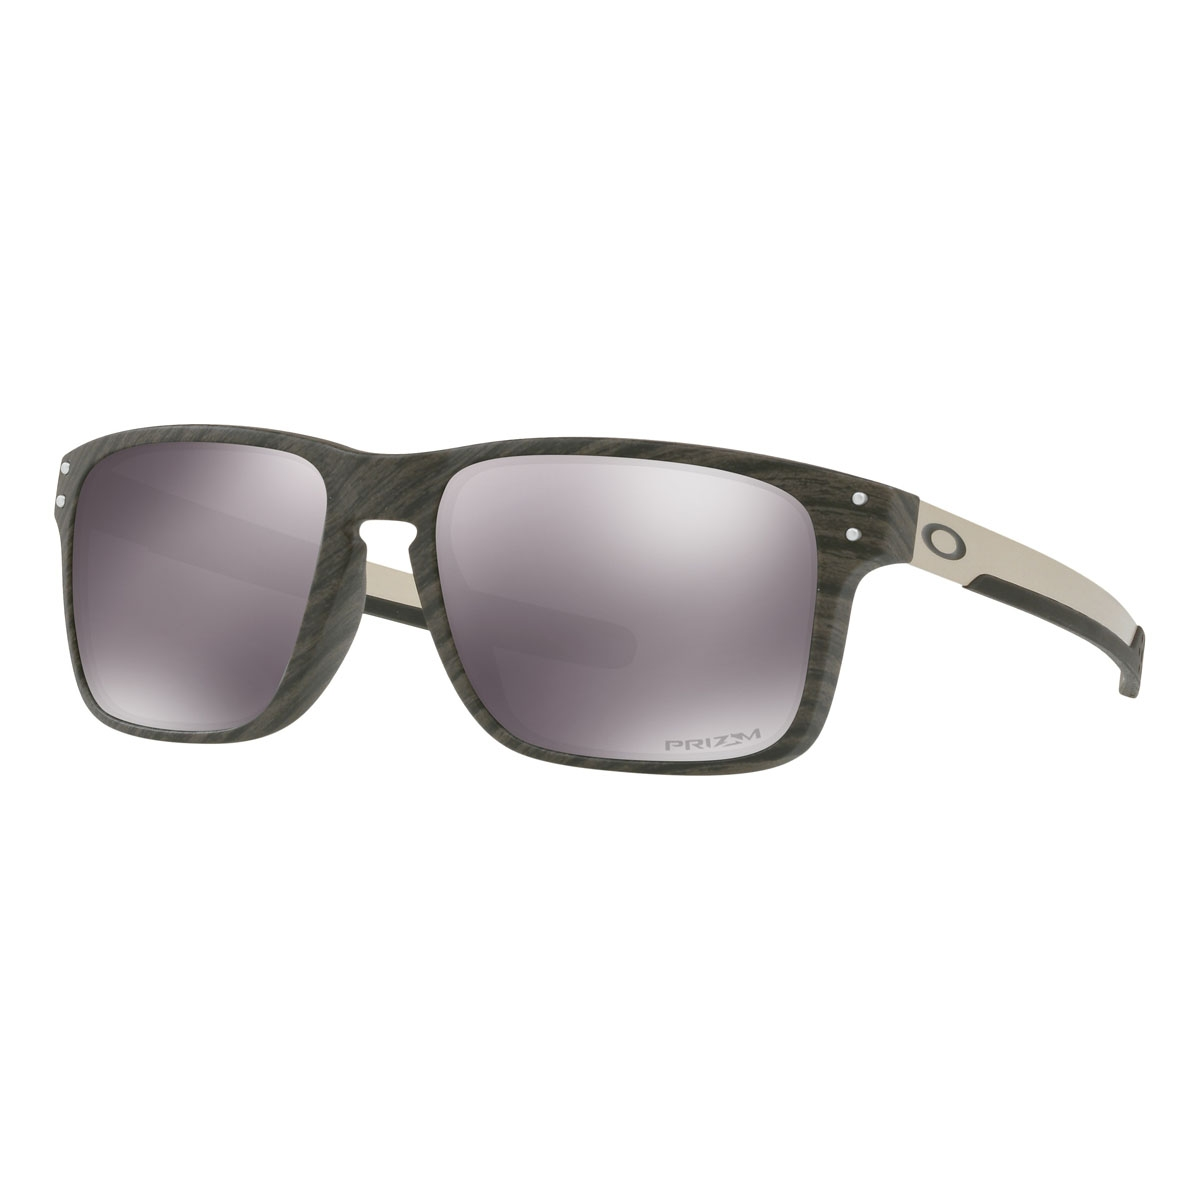 759dada1702 ... polarized cb4b6 2993b  official store image of oakley holbrook mix prizm  sunglasses woodgrain frame prizm black lens ca614 803b0